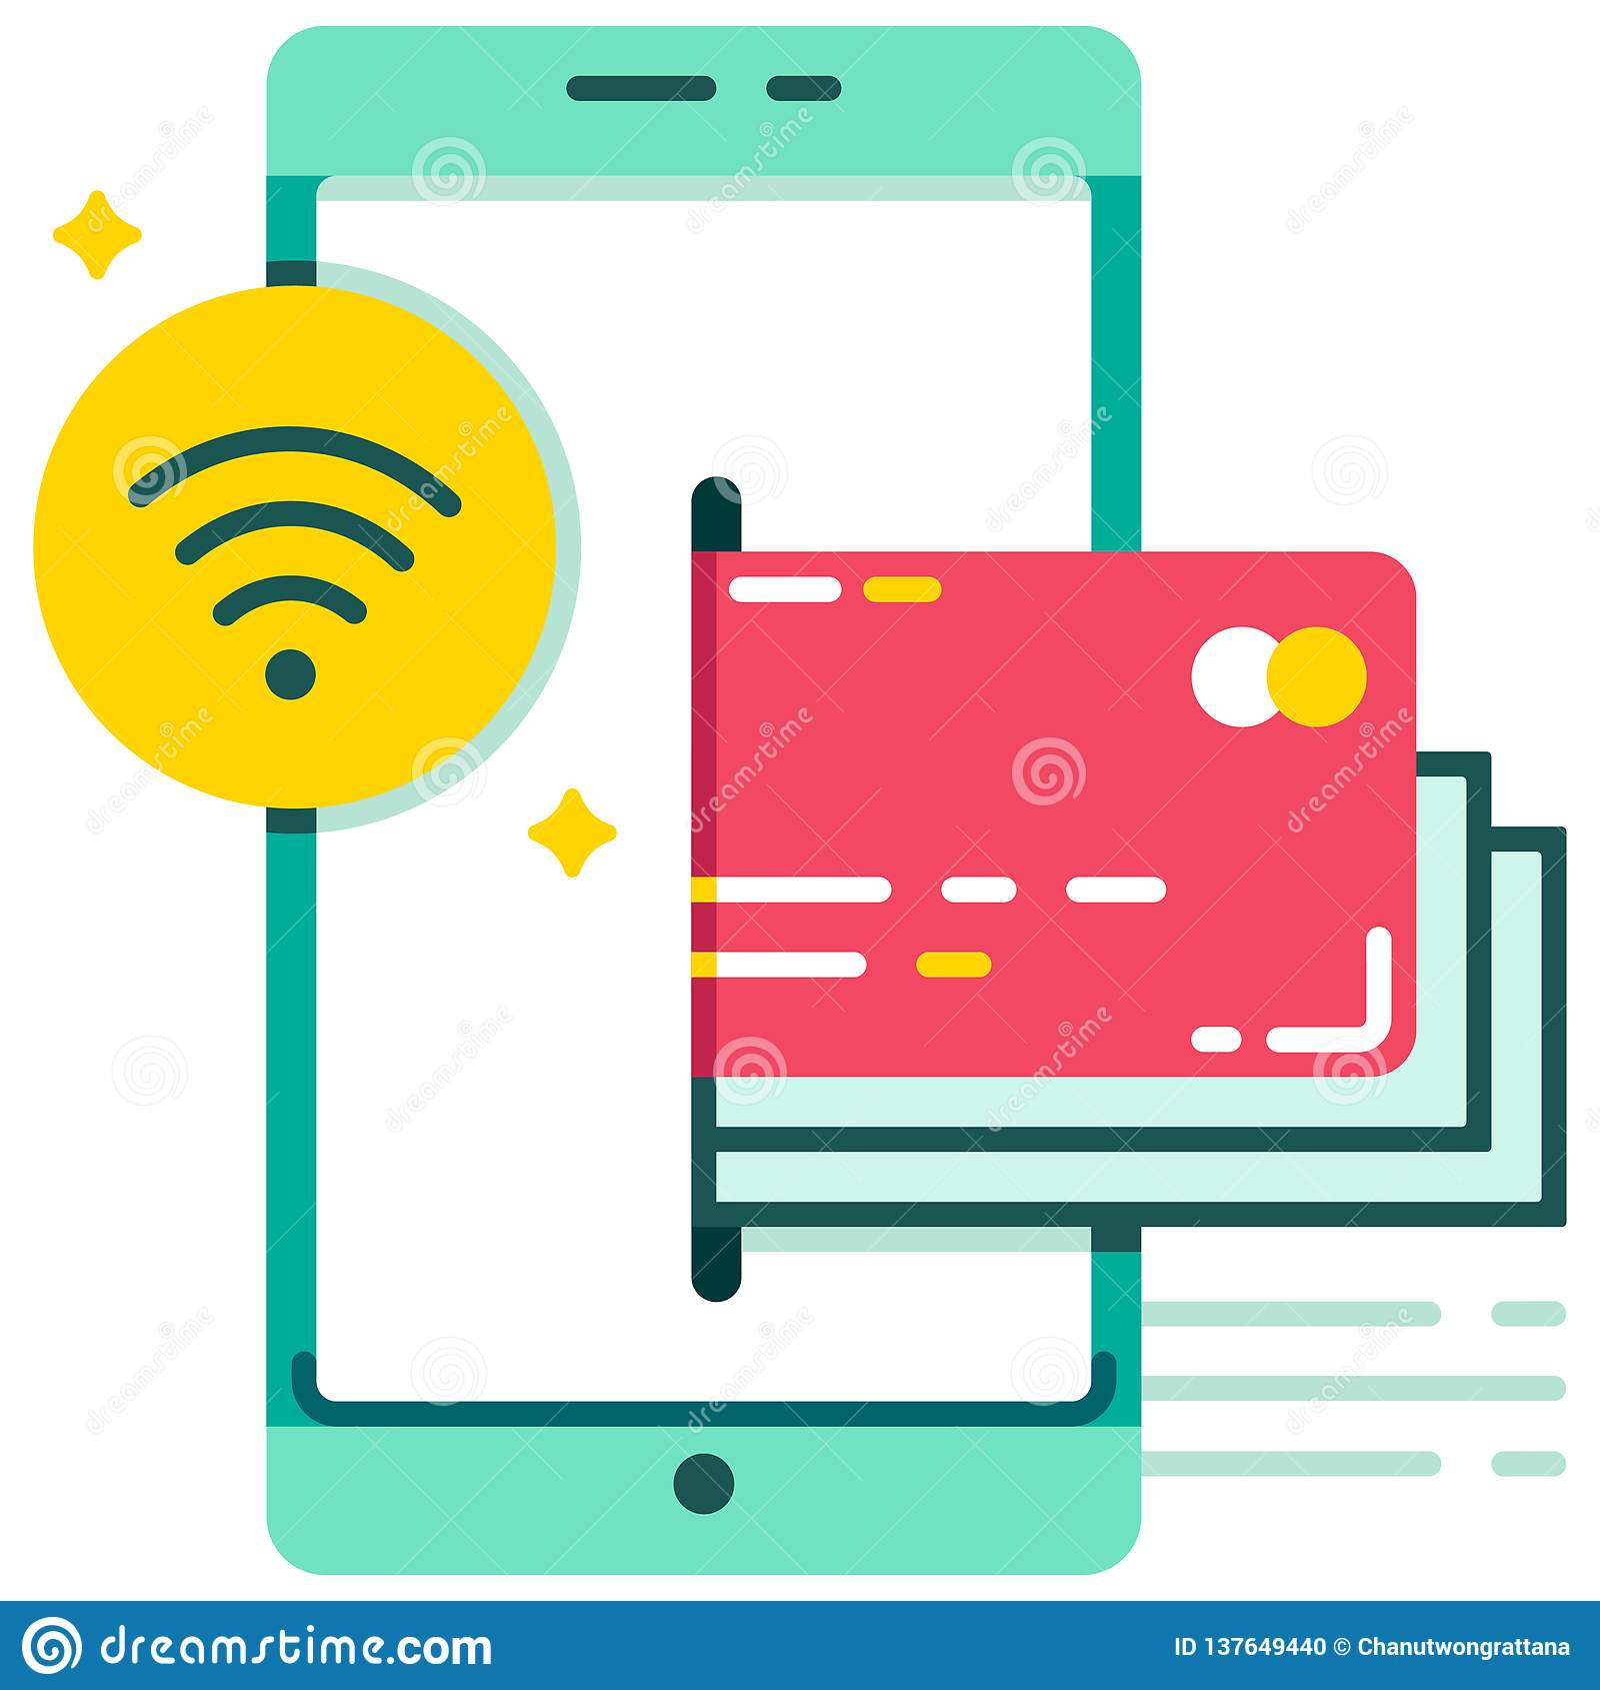 E-wallet Near-filed communication payment flat illustration